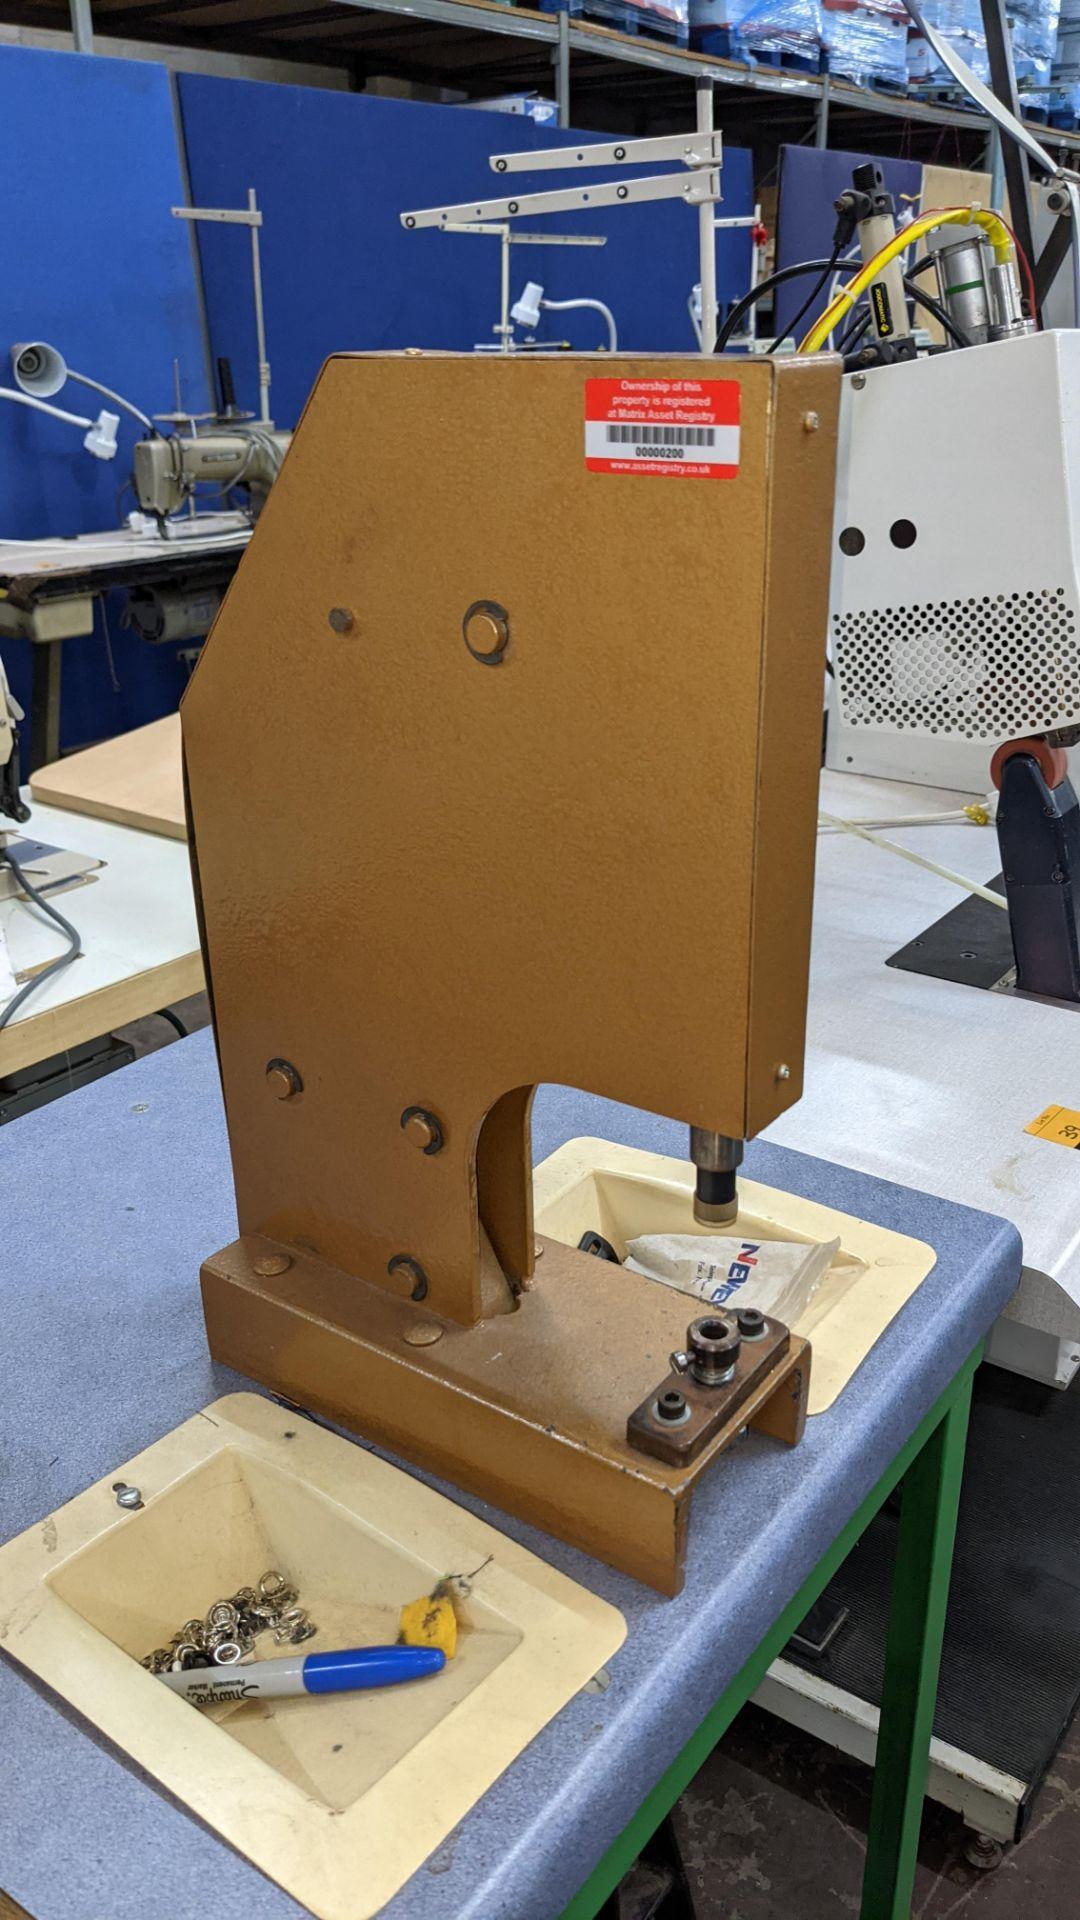 Foot operated riveting machine/press stud machine - Image 7 of 8